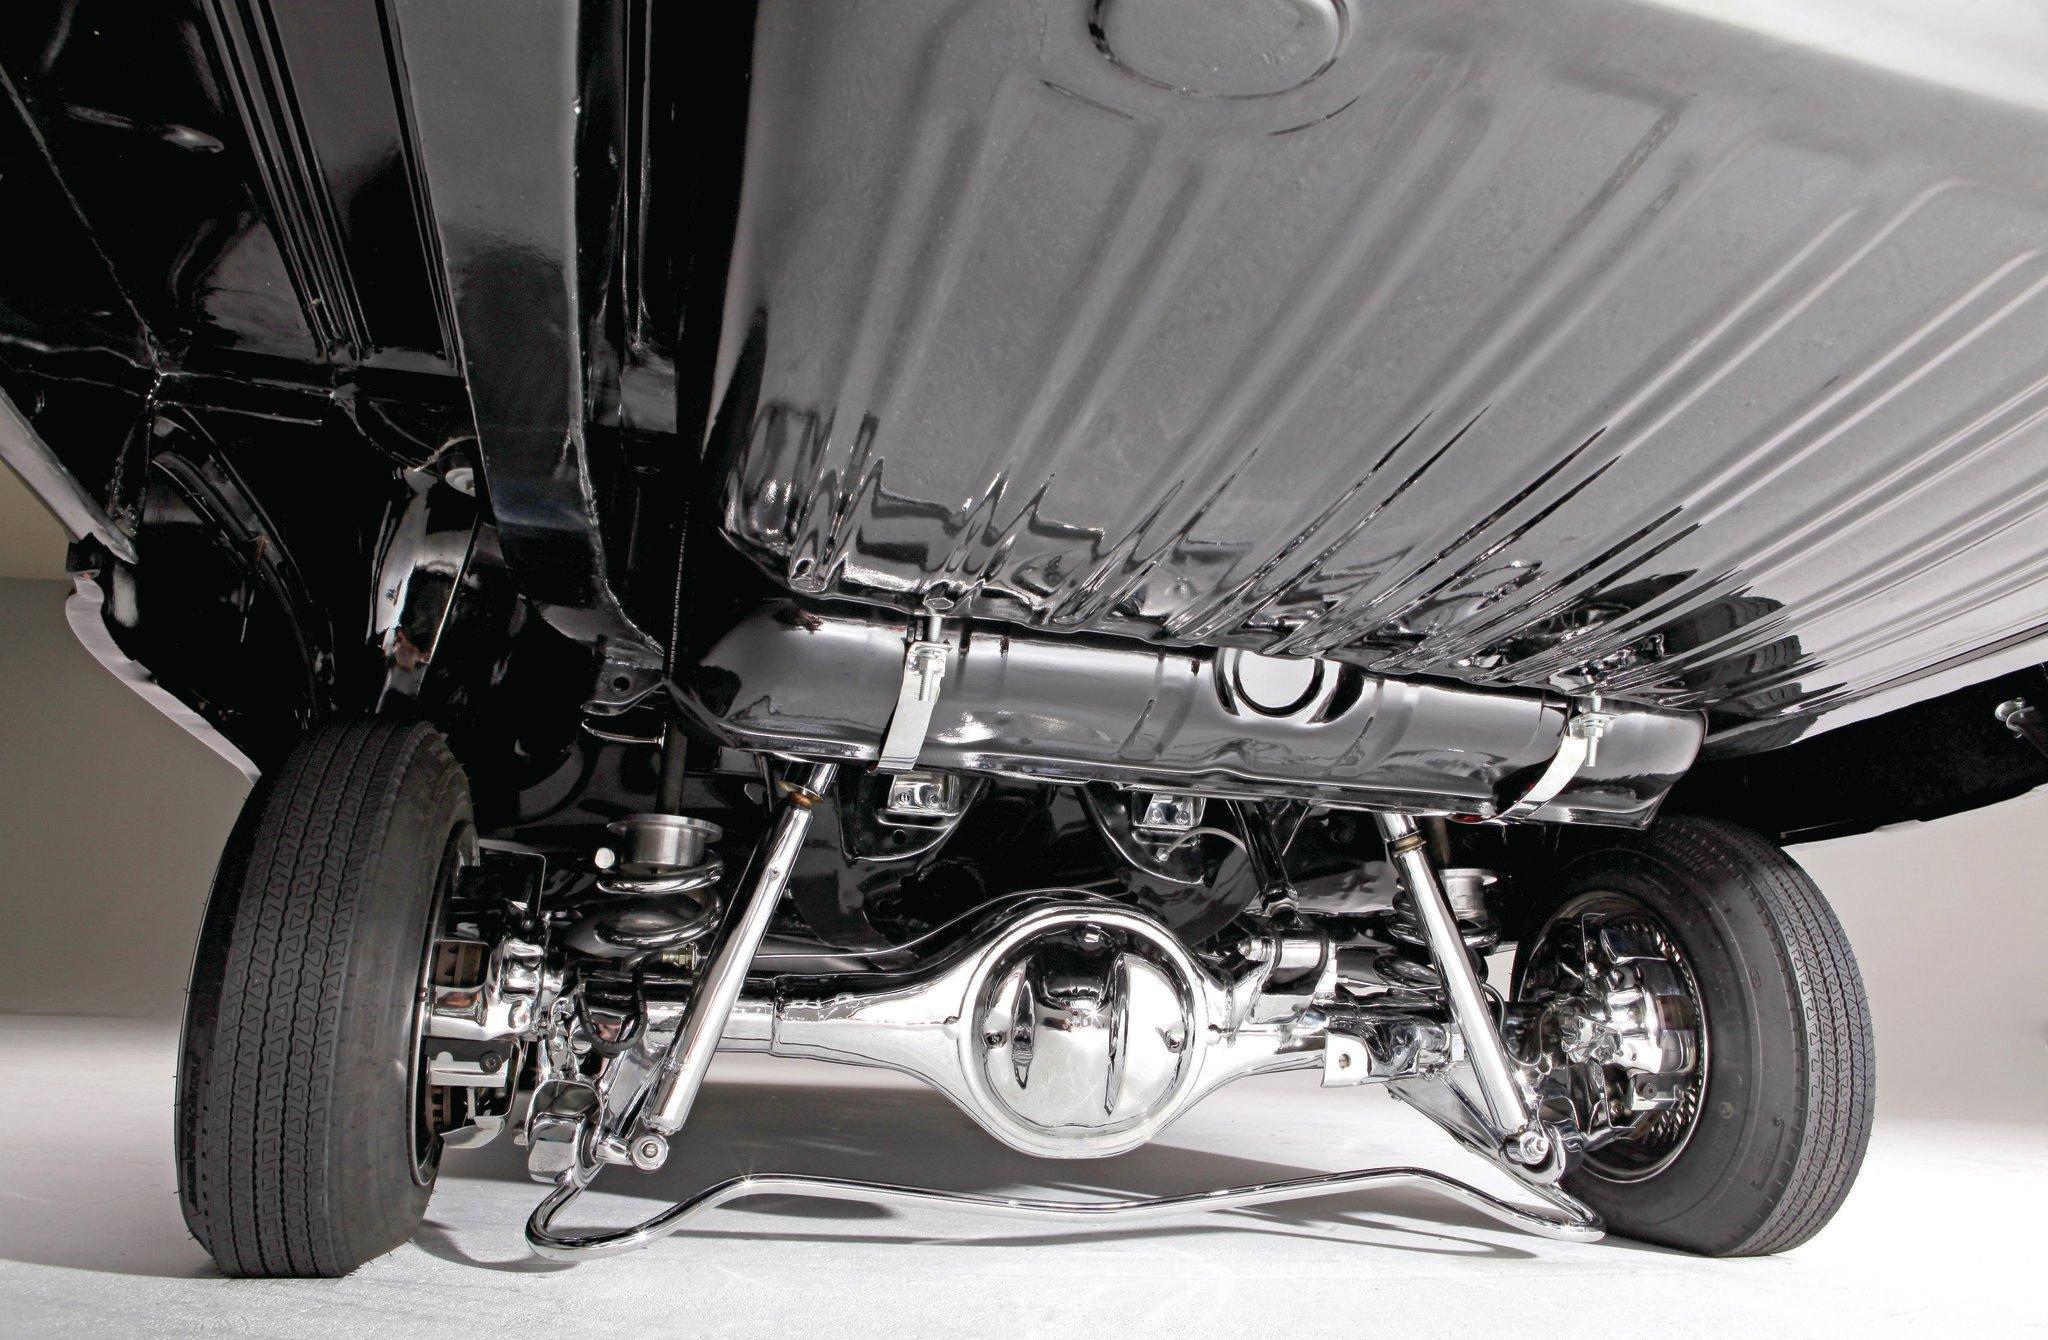 1962 Chevrolet Impala Black Diamond